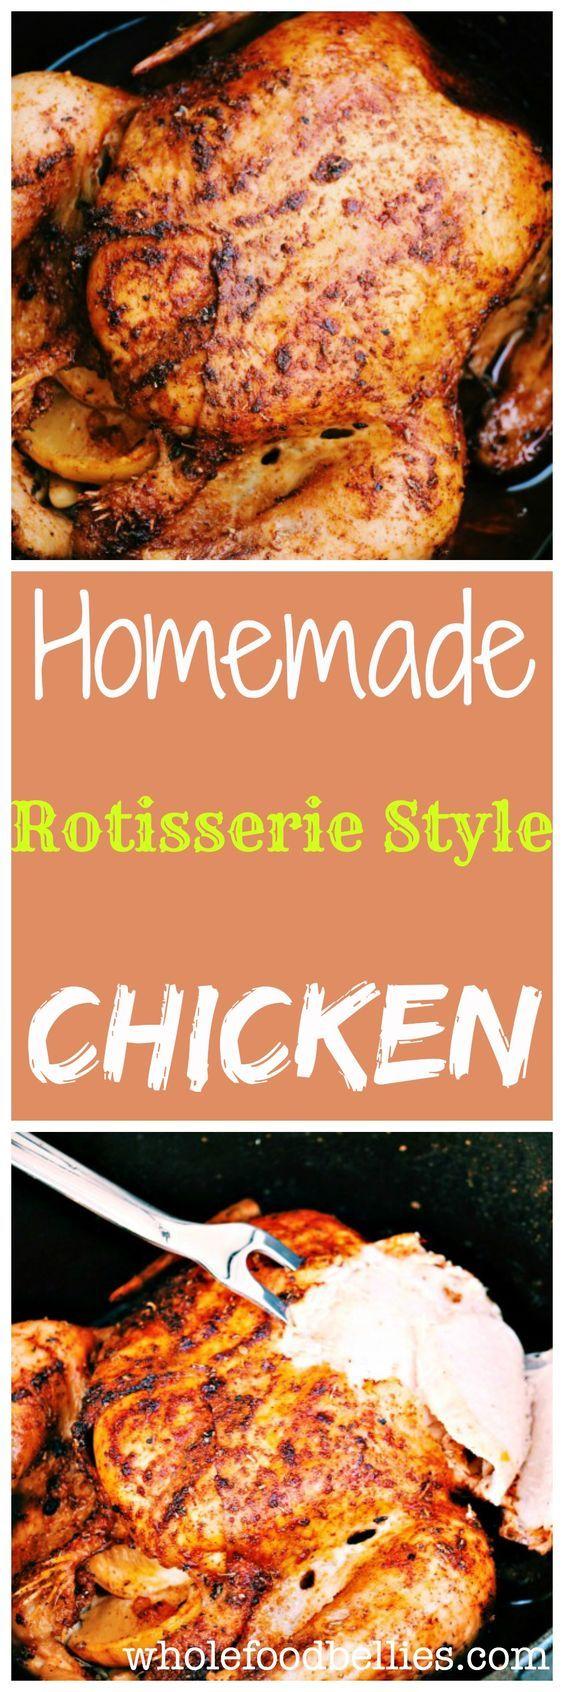 Homemade Rotisserie Style Chicken Recipe - (wholefoodbellies)